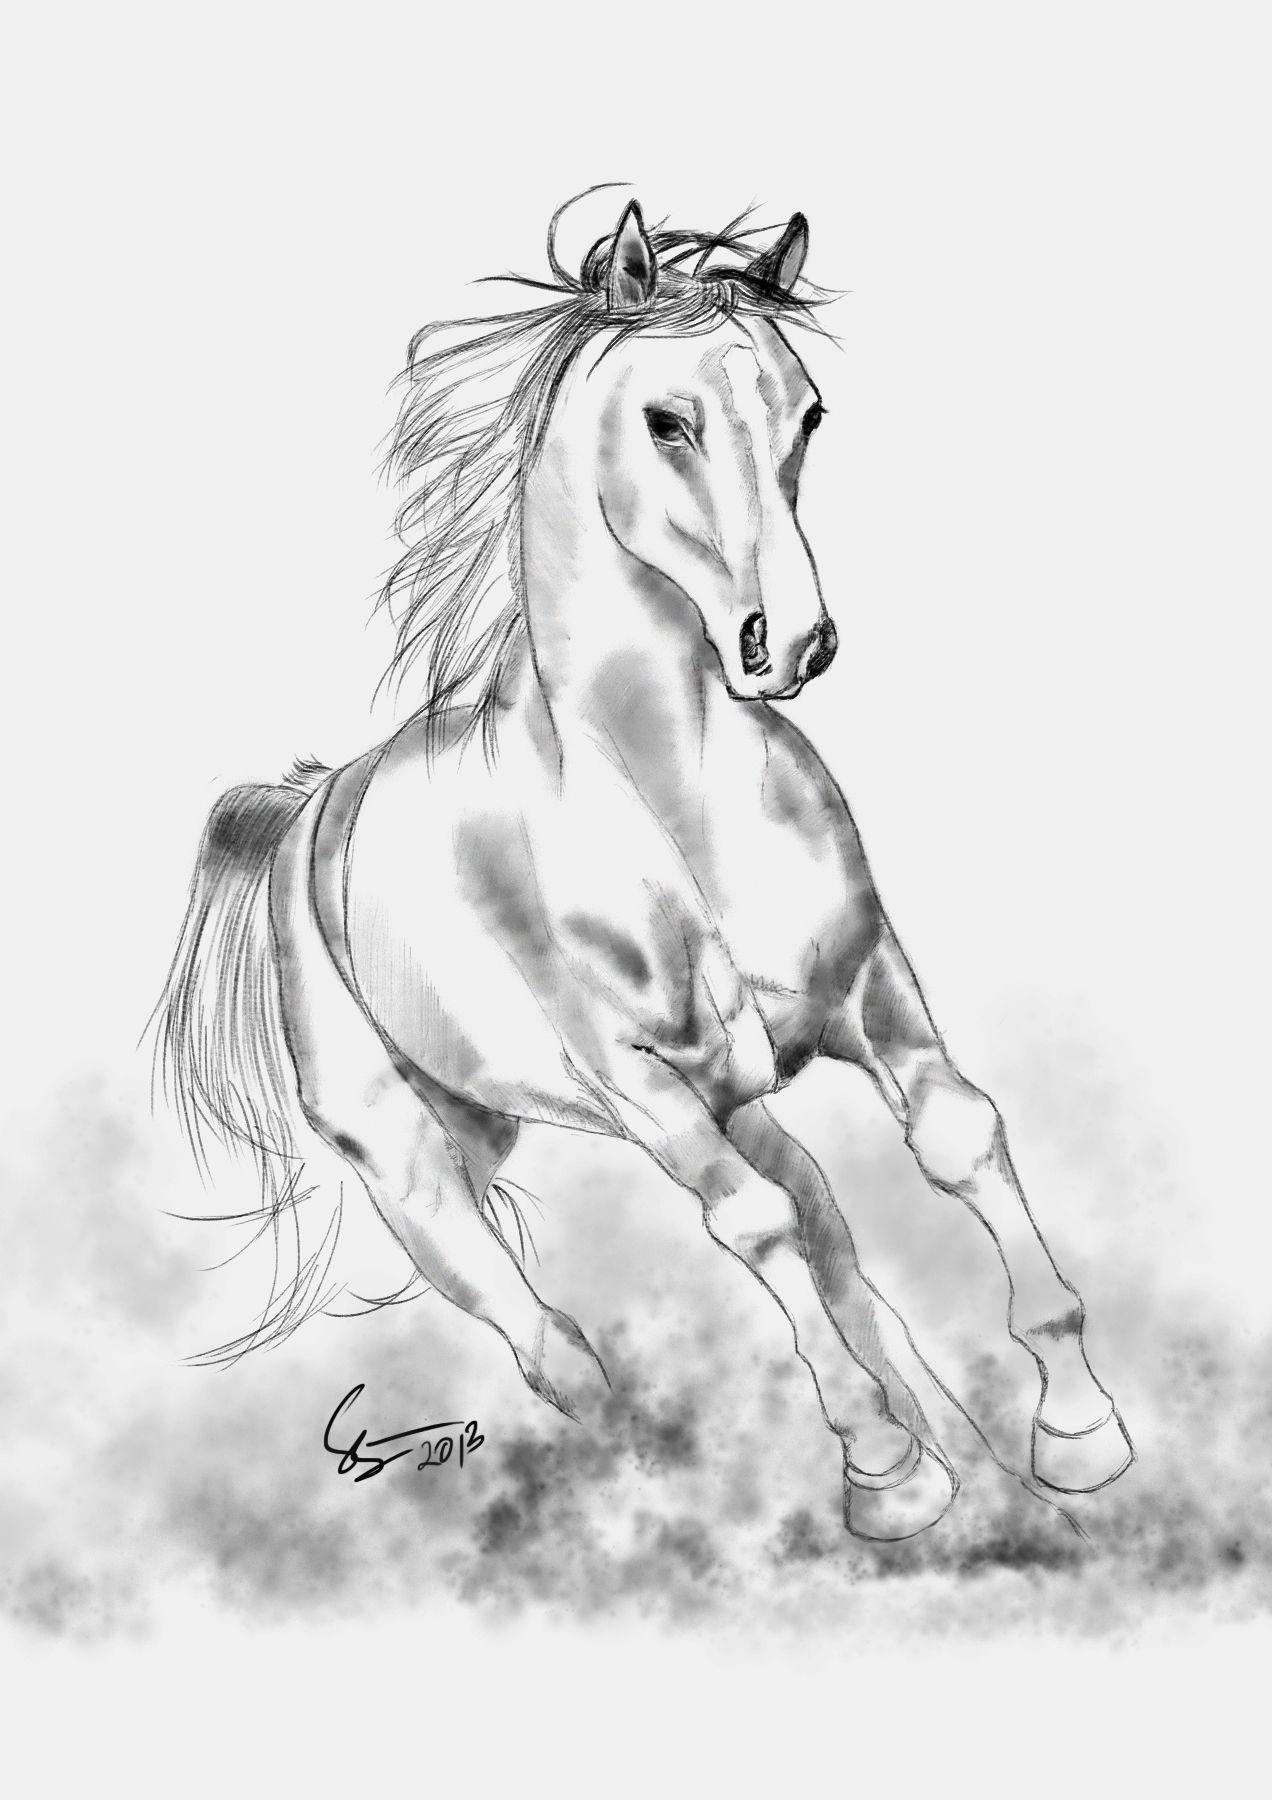 Horse Sketch Drawing Pencil Gambar Lukisan Seni Pensil